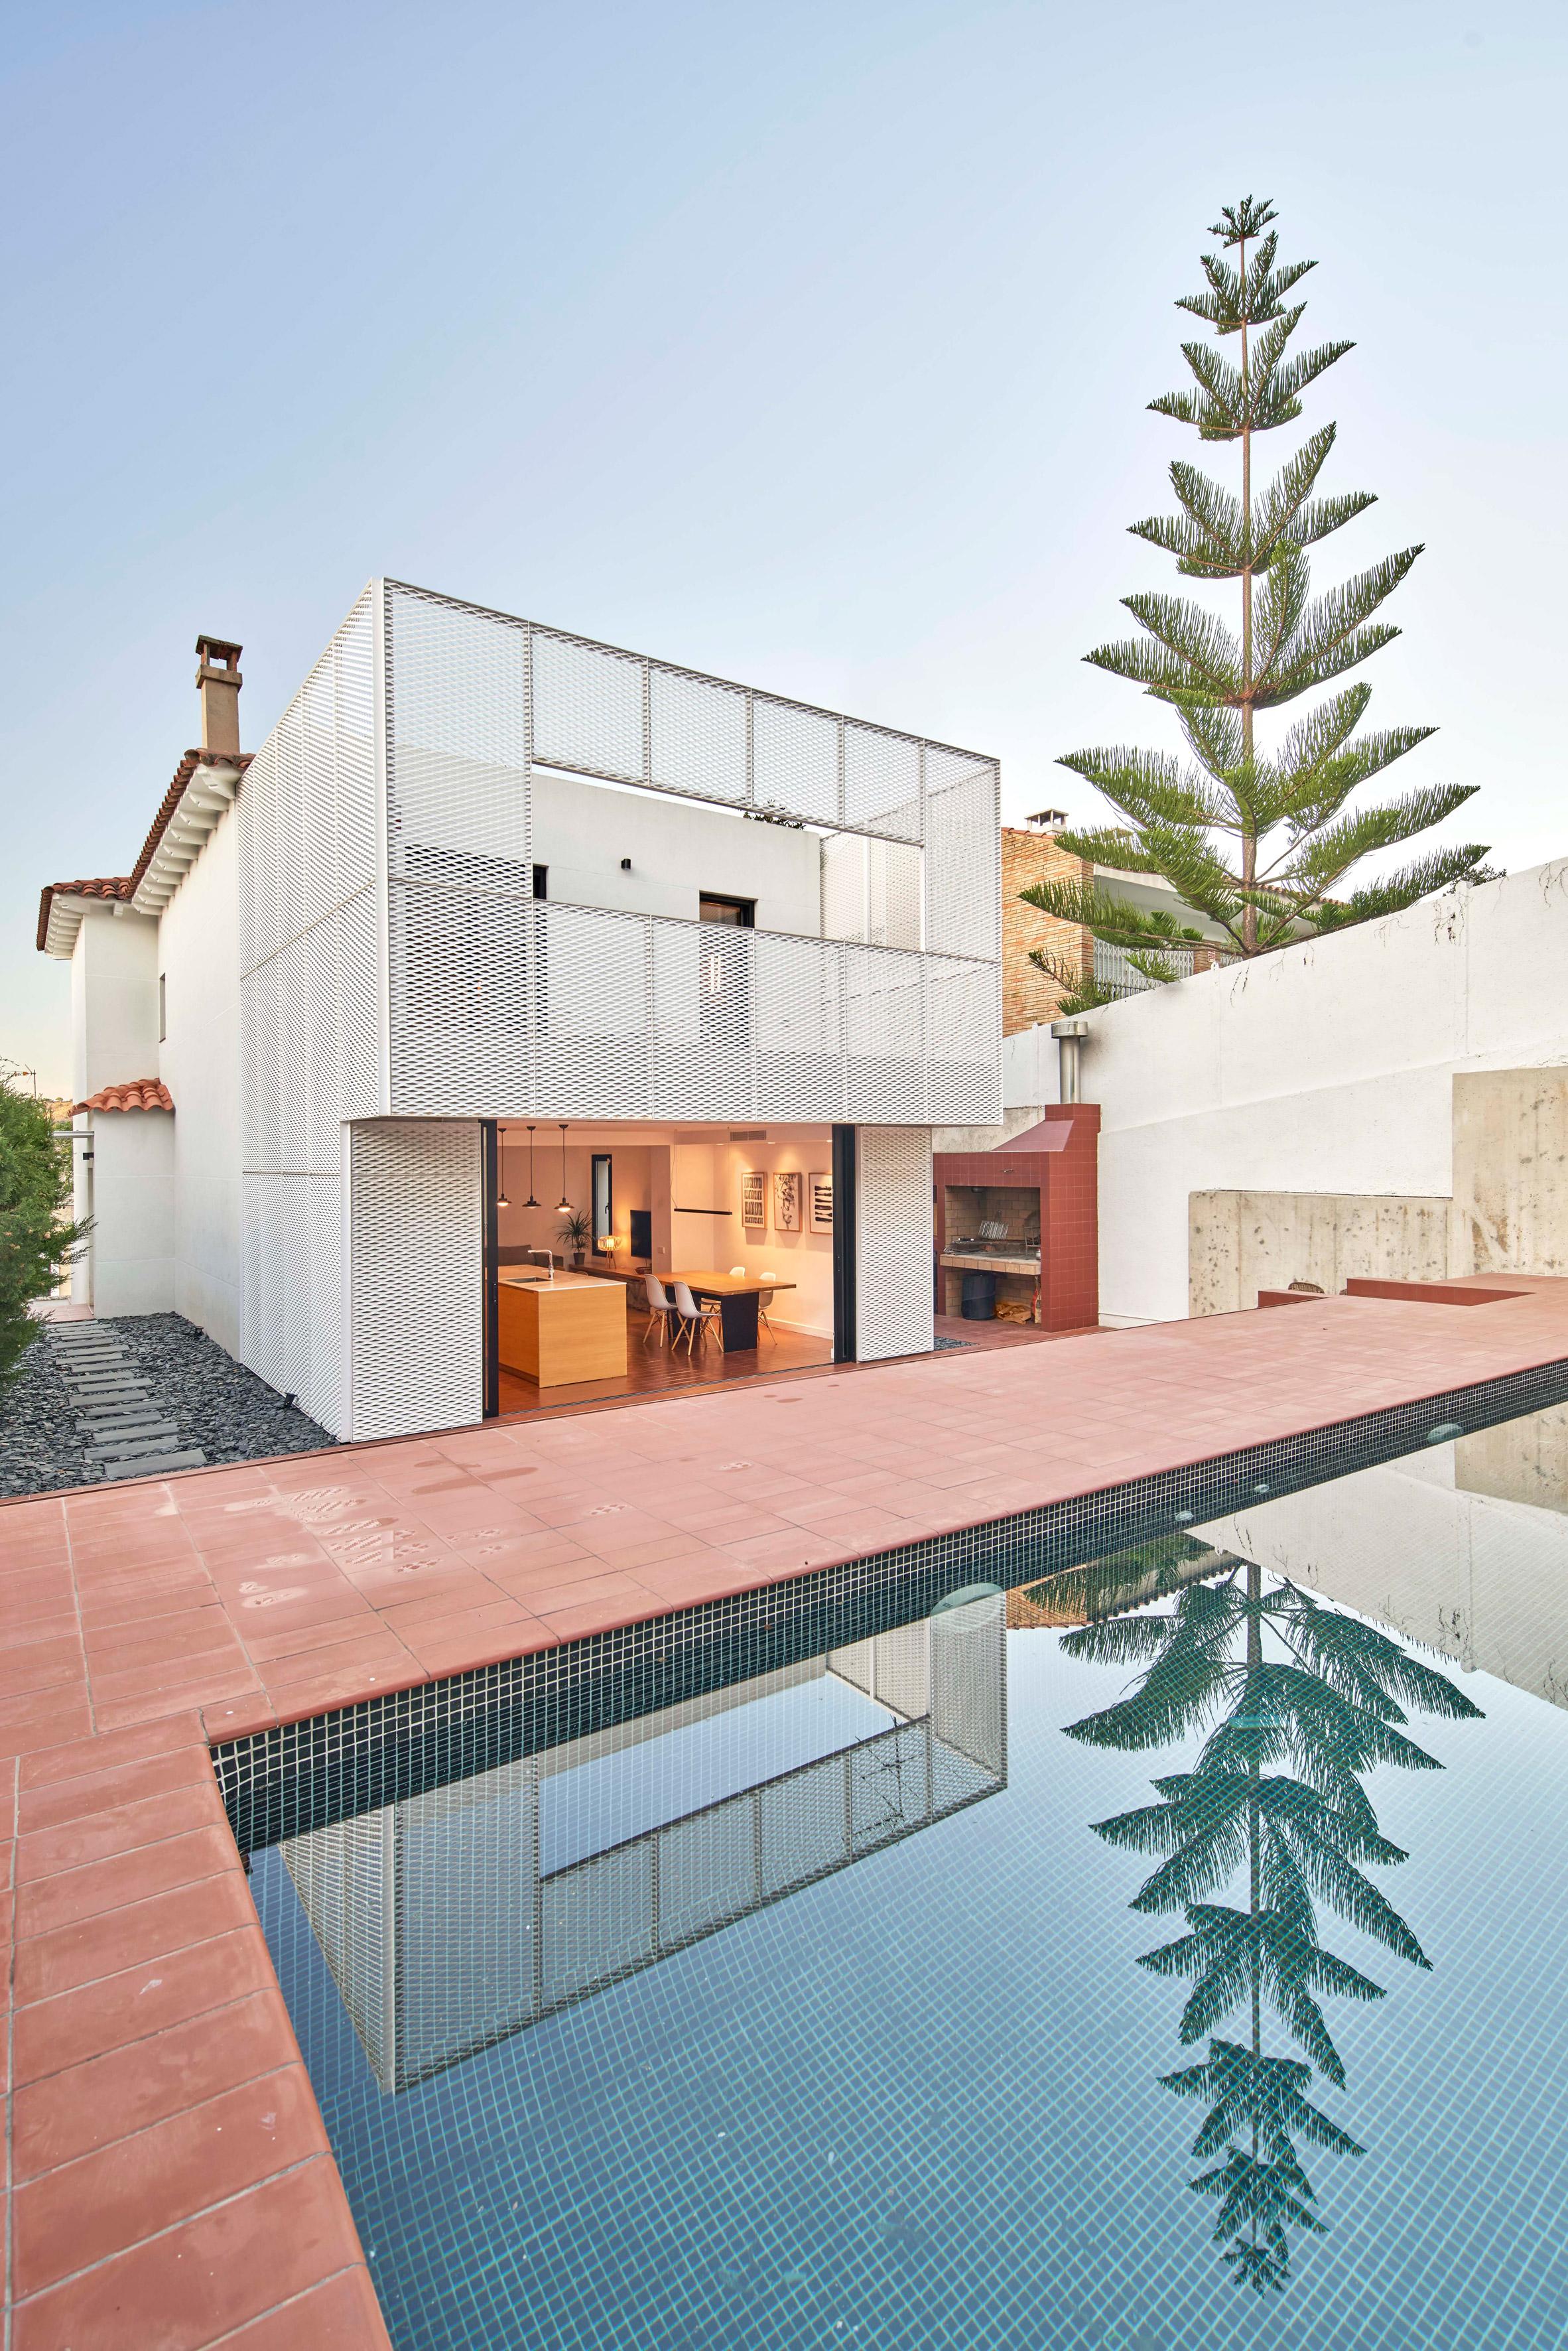 Family home by Bonba Studio